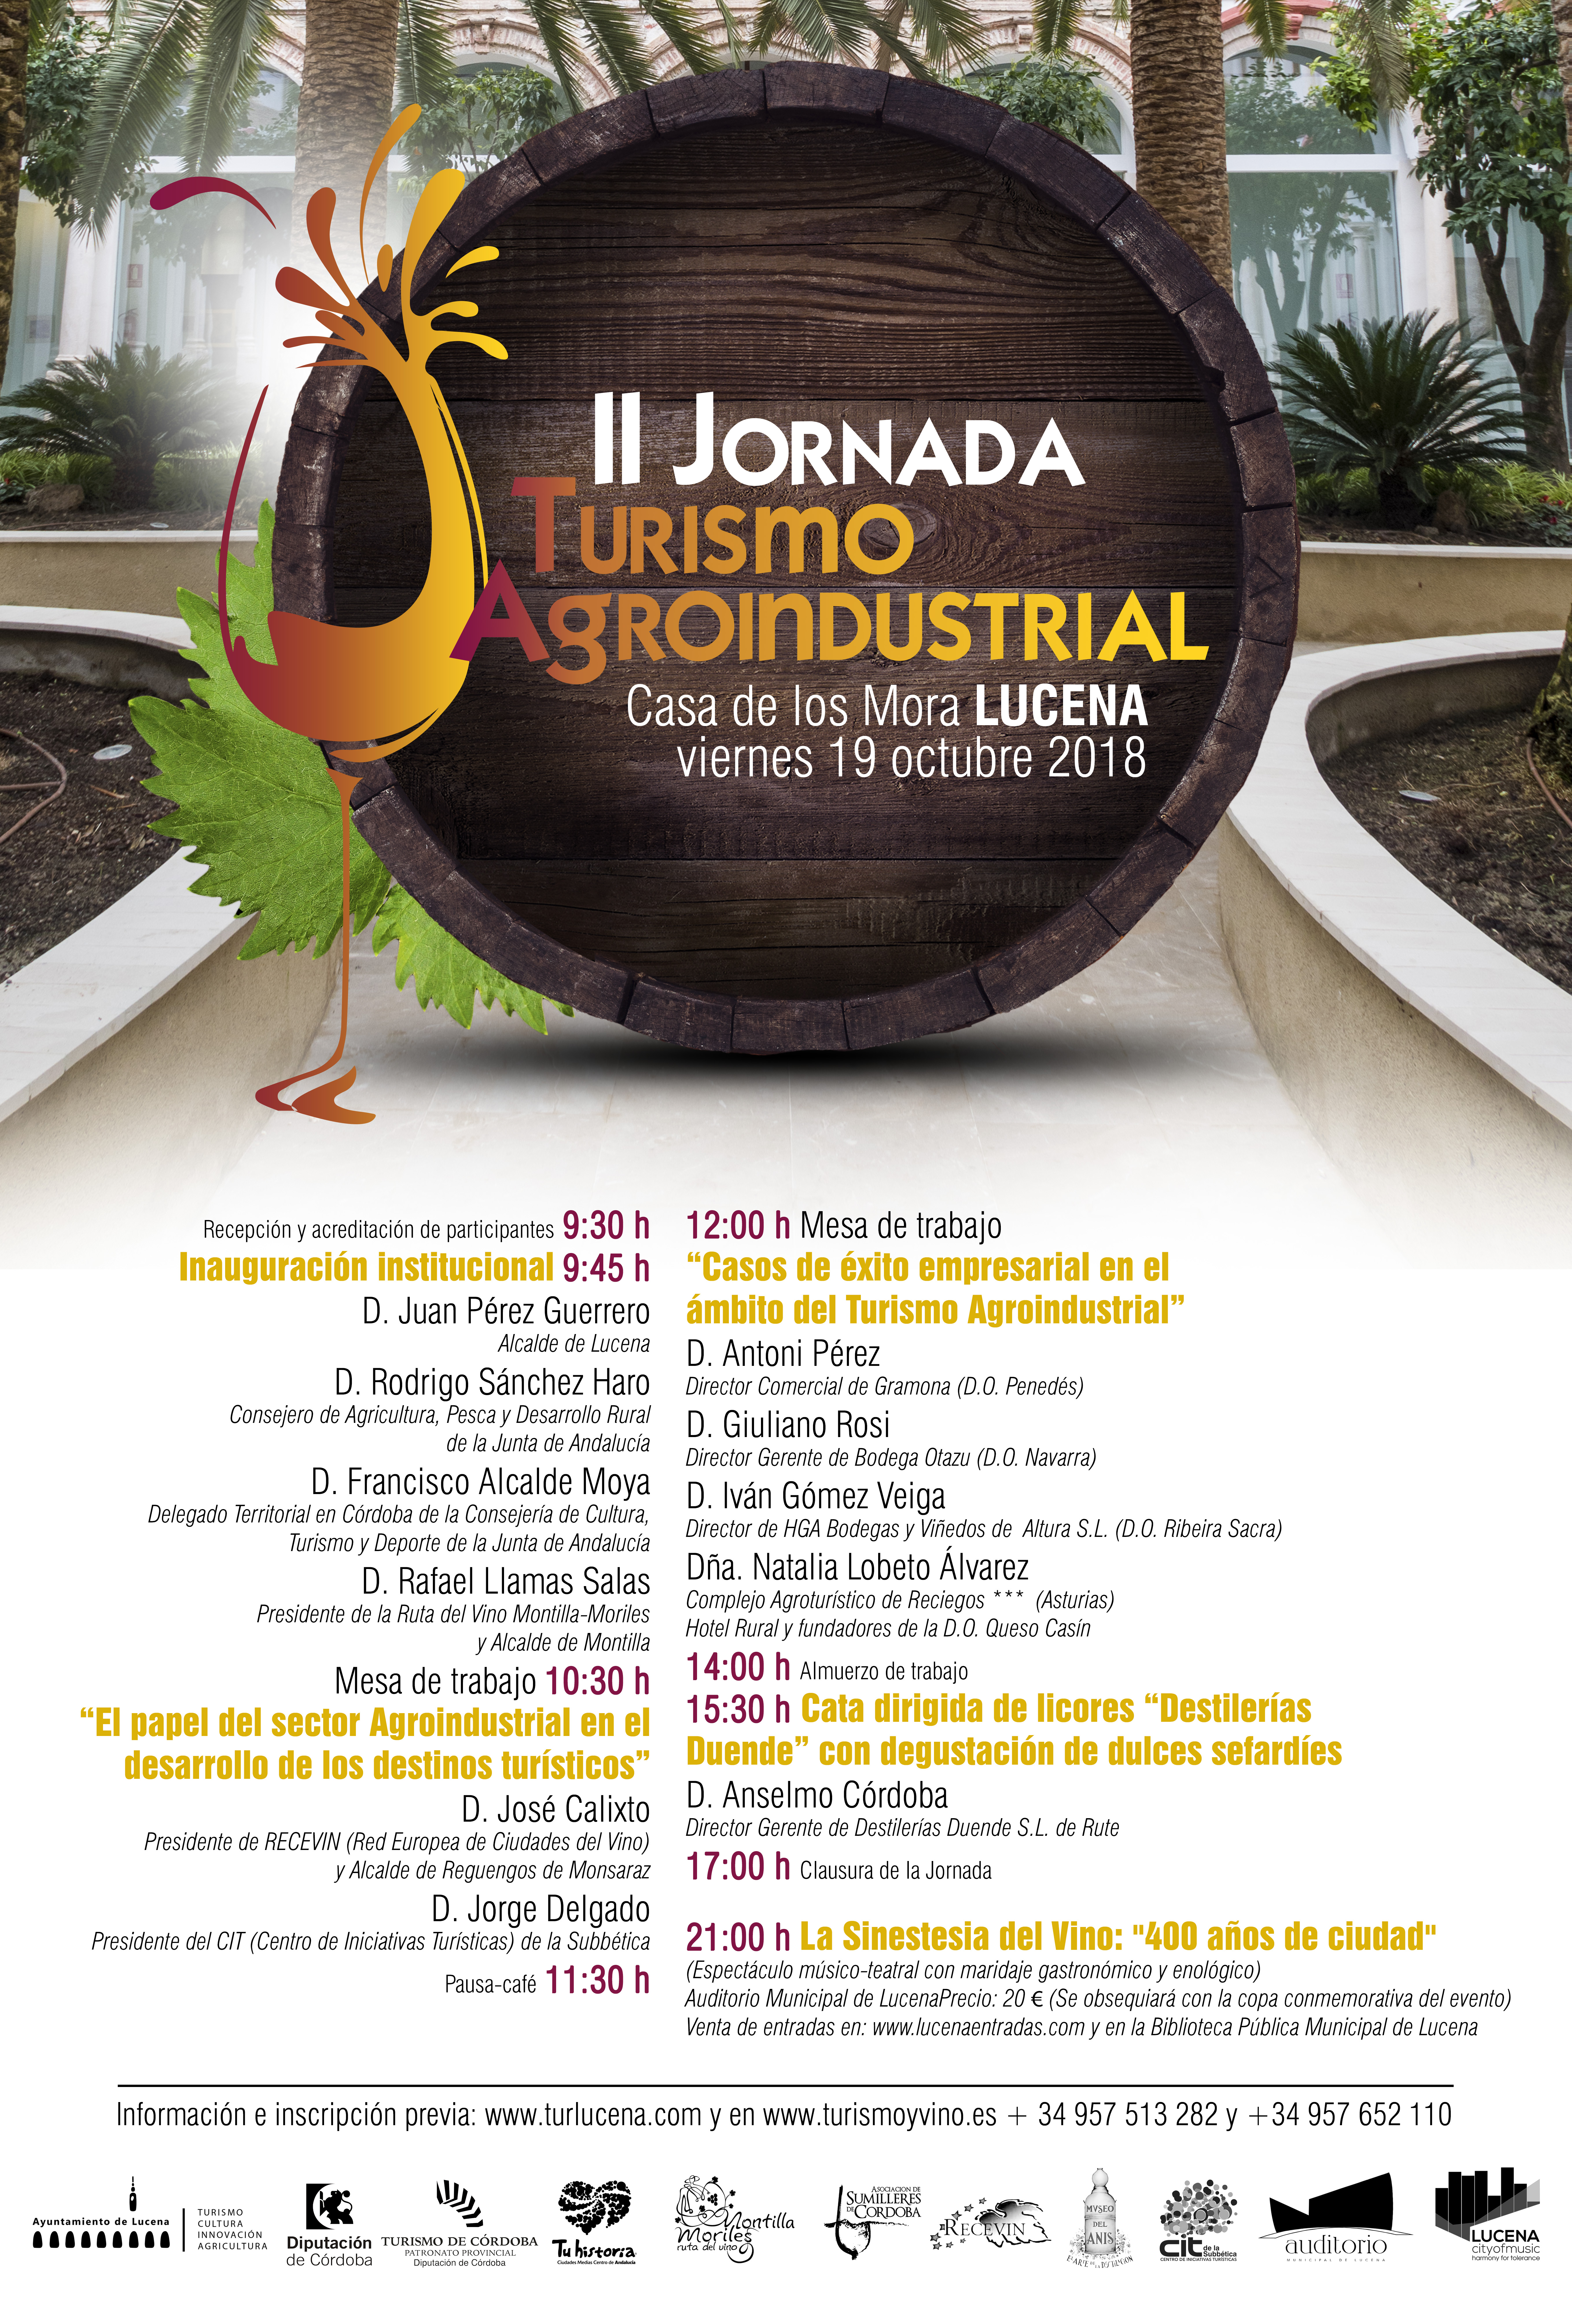 II Jornada de Turismo Agroindustrial en Lucena